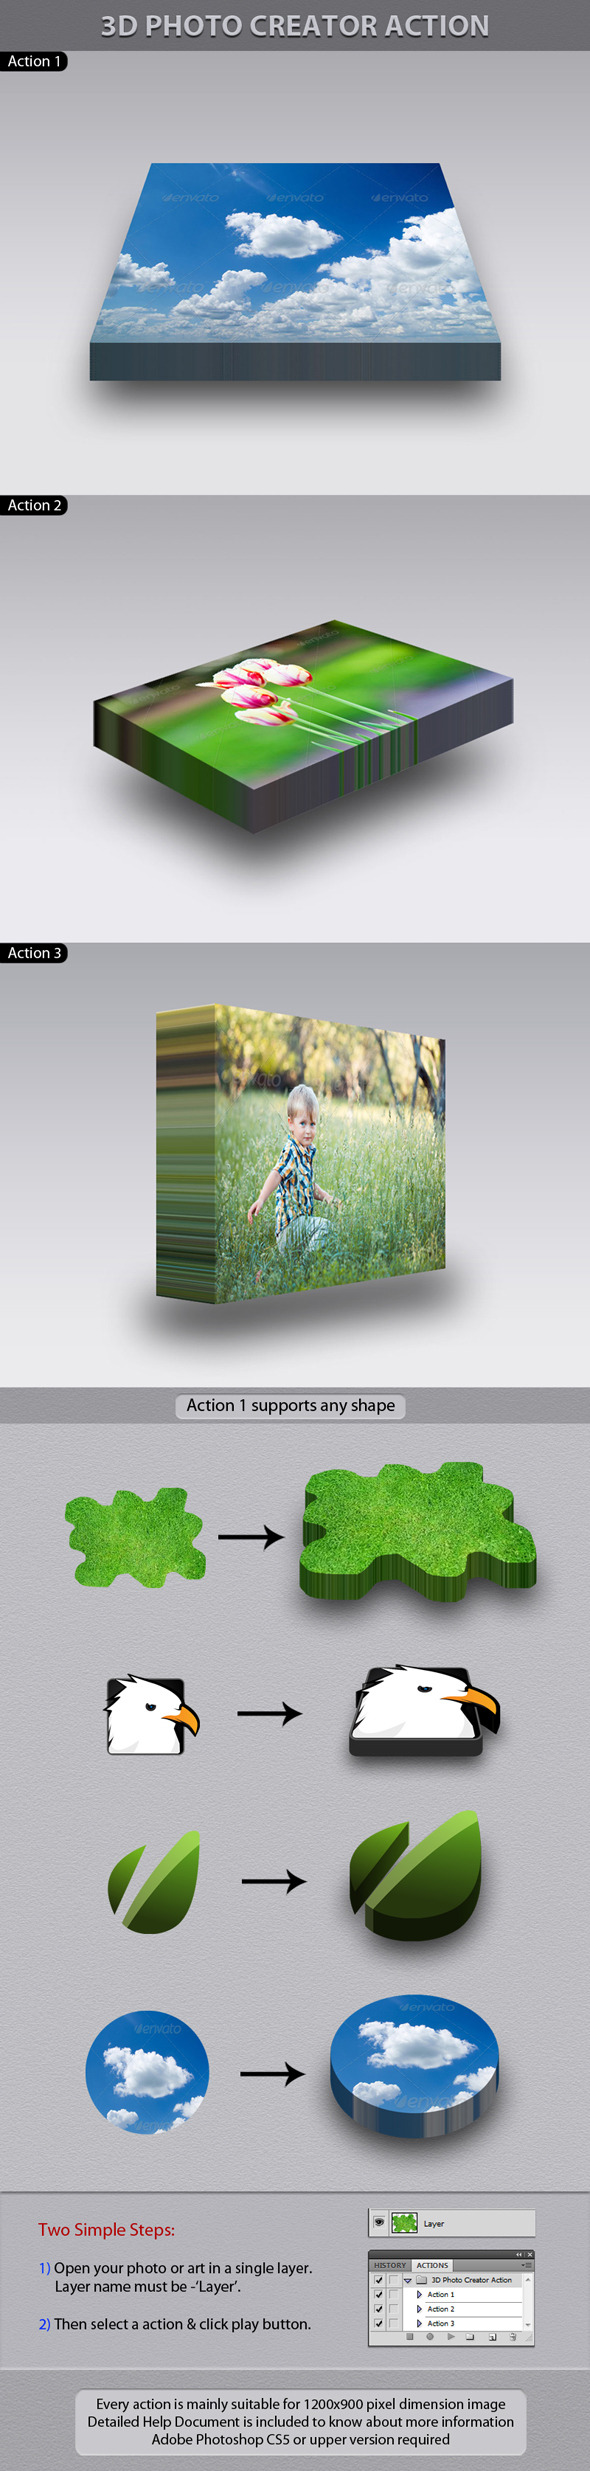 3D Photo Creator Action